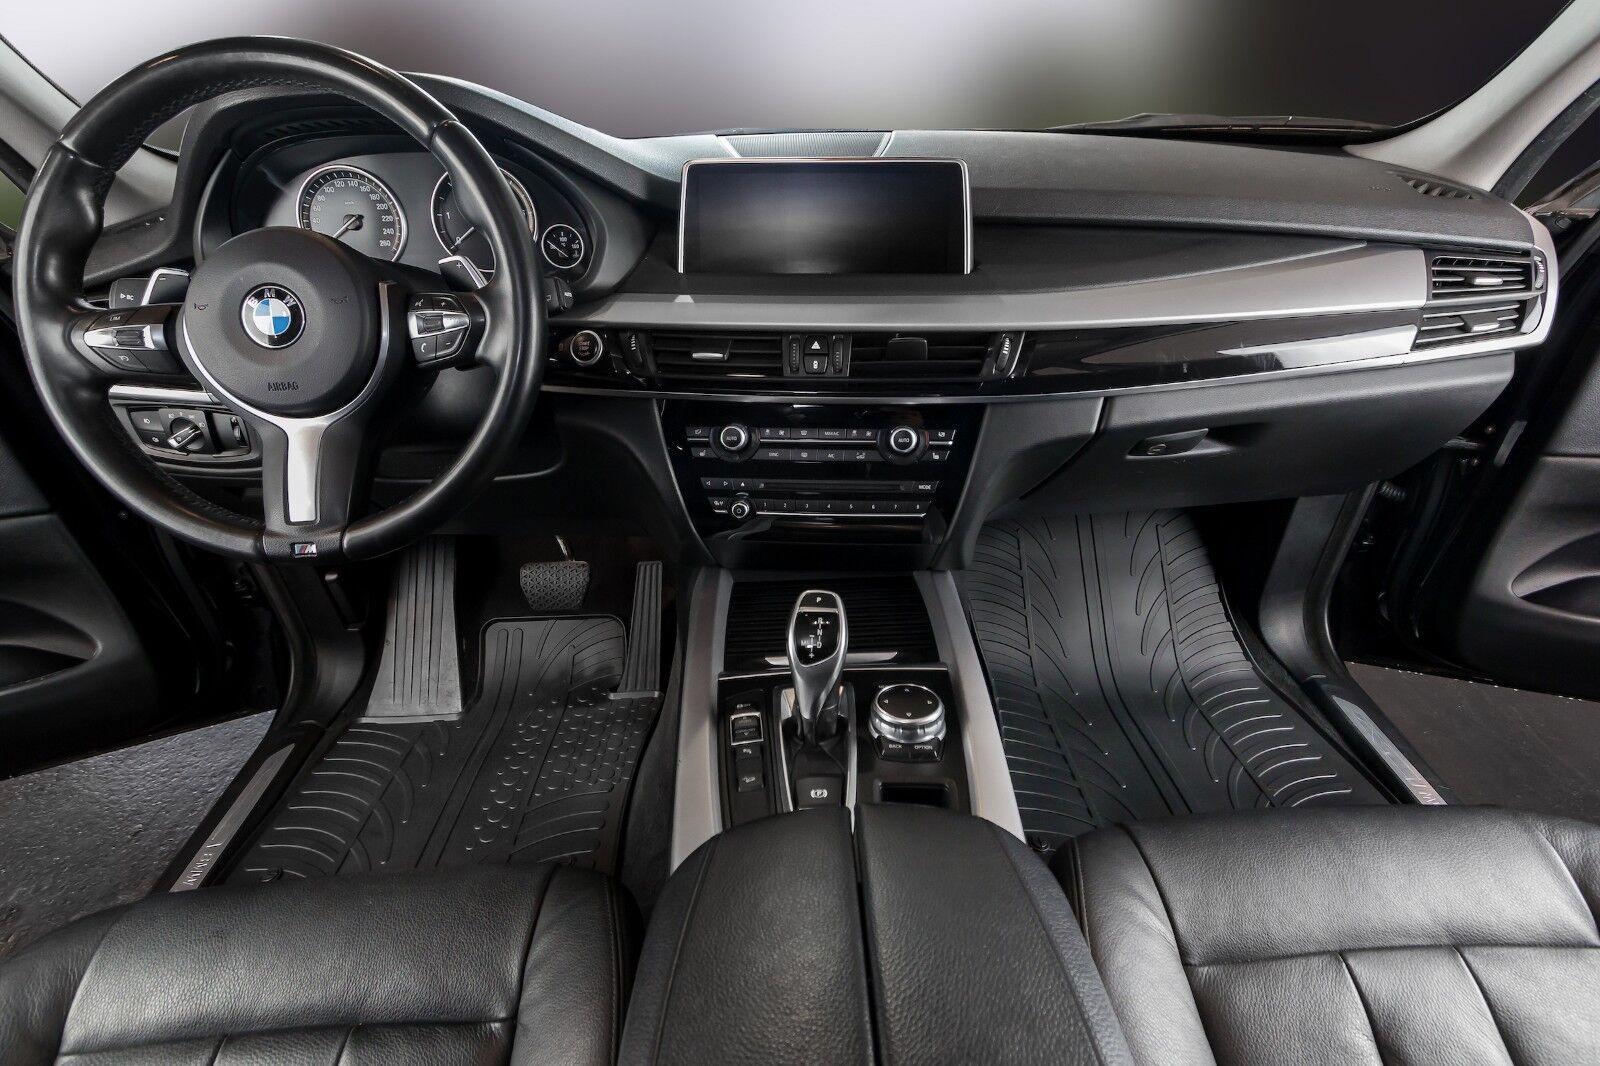 Gummi-Kofferraumwanne BMW 5er F11 Touring Kombi 2010-2017 Gummi-Kofferraummatte